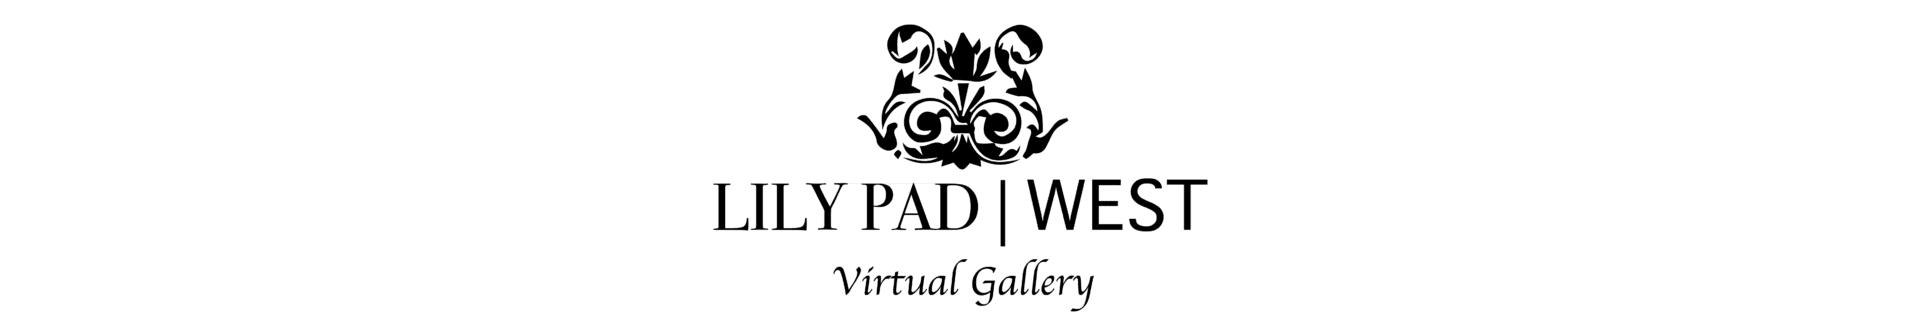 LPG_Virtual_Gallery_Banner